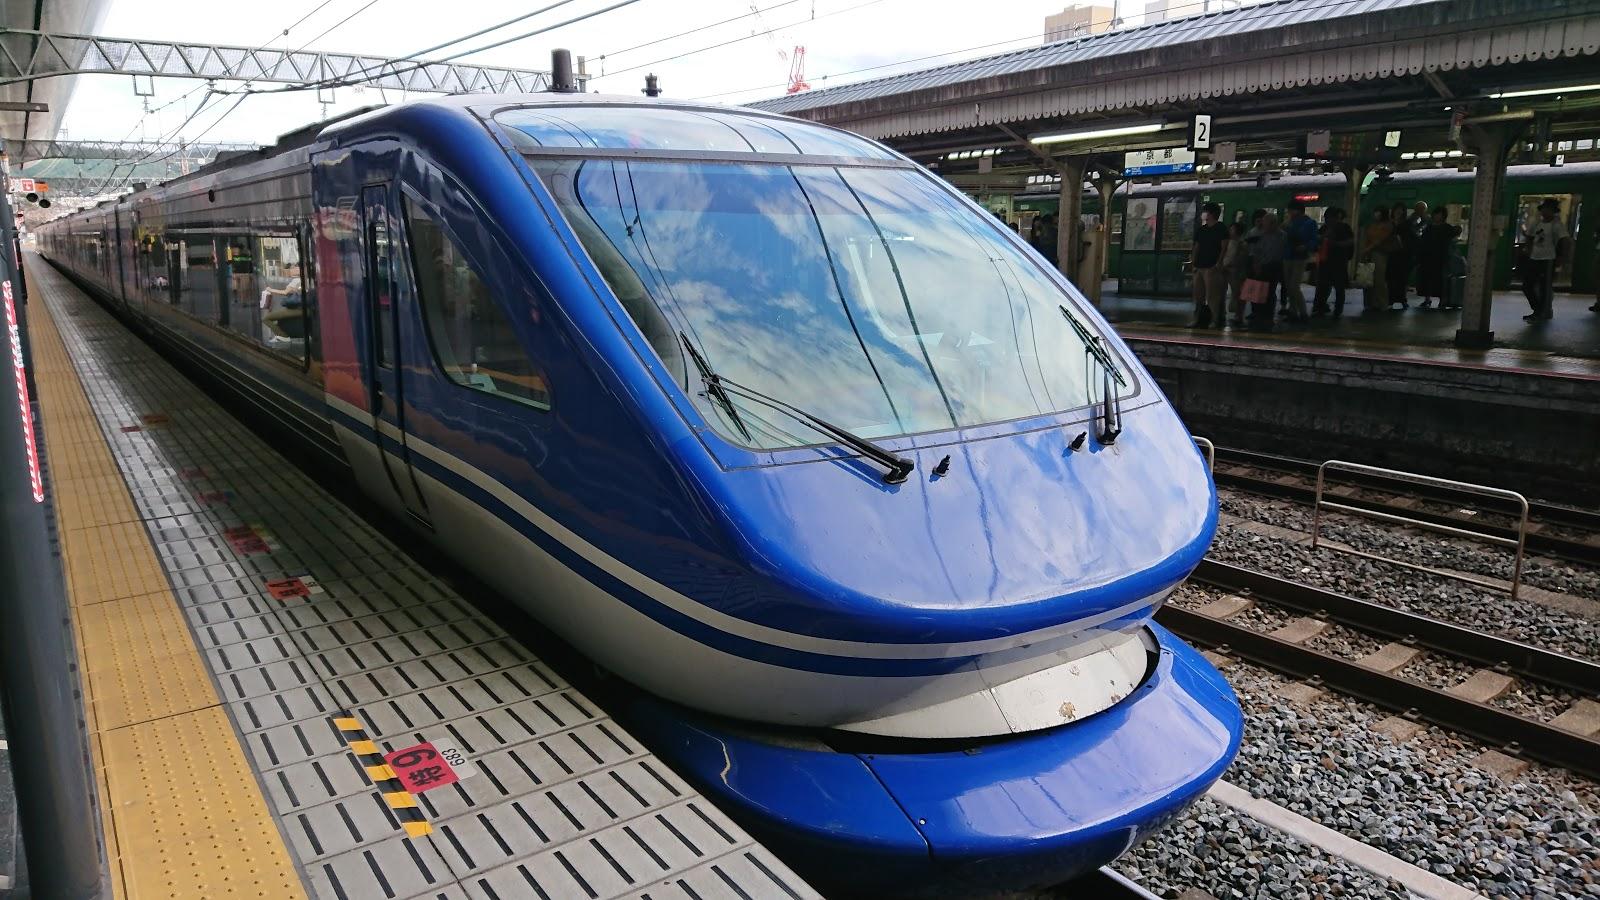 Blair's 鐵道攝影: JR西日本/智頭急行HOT7000系柴油車 超級白兔號列車 Super Hakuto